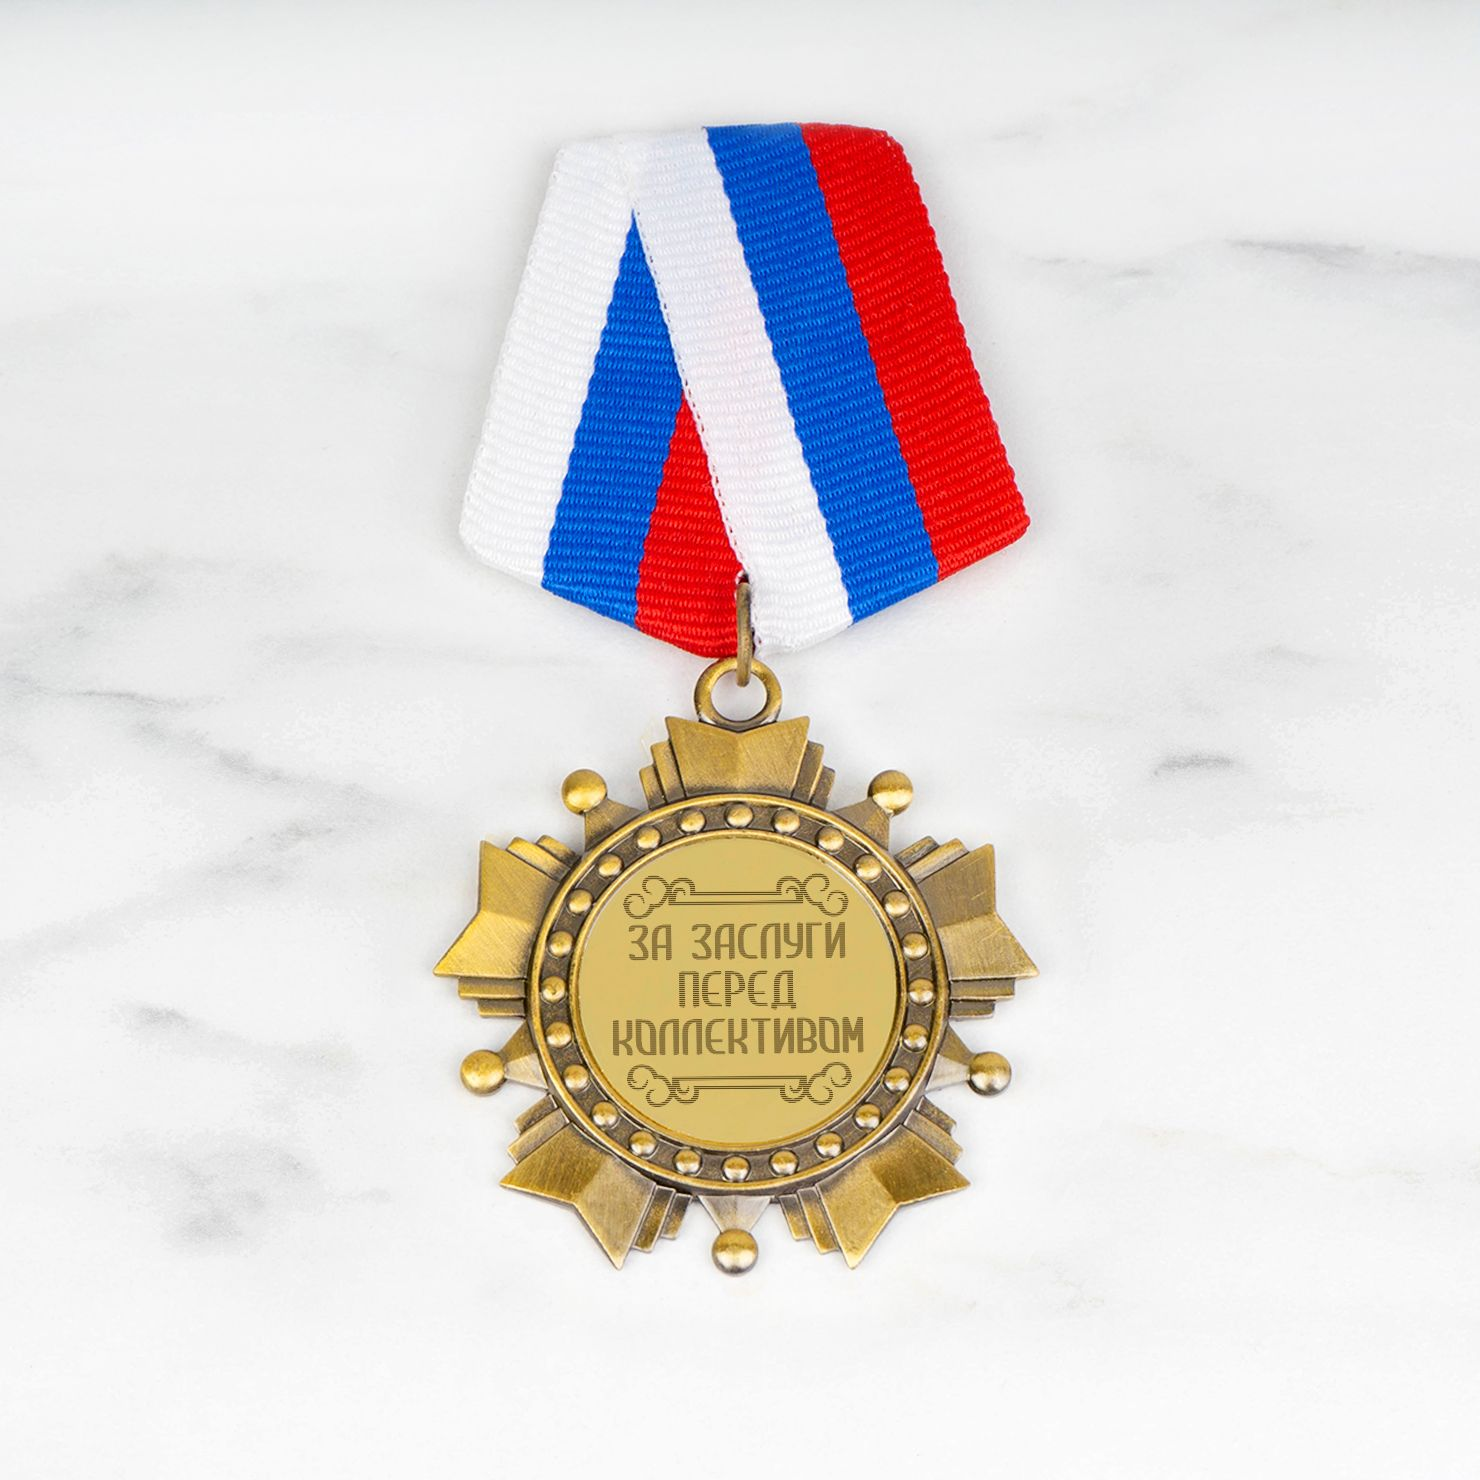 Орден *За заслуги перед коллективом*